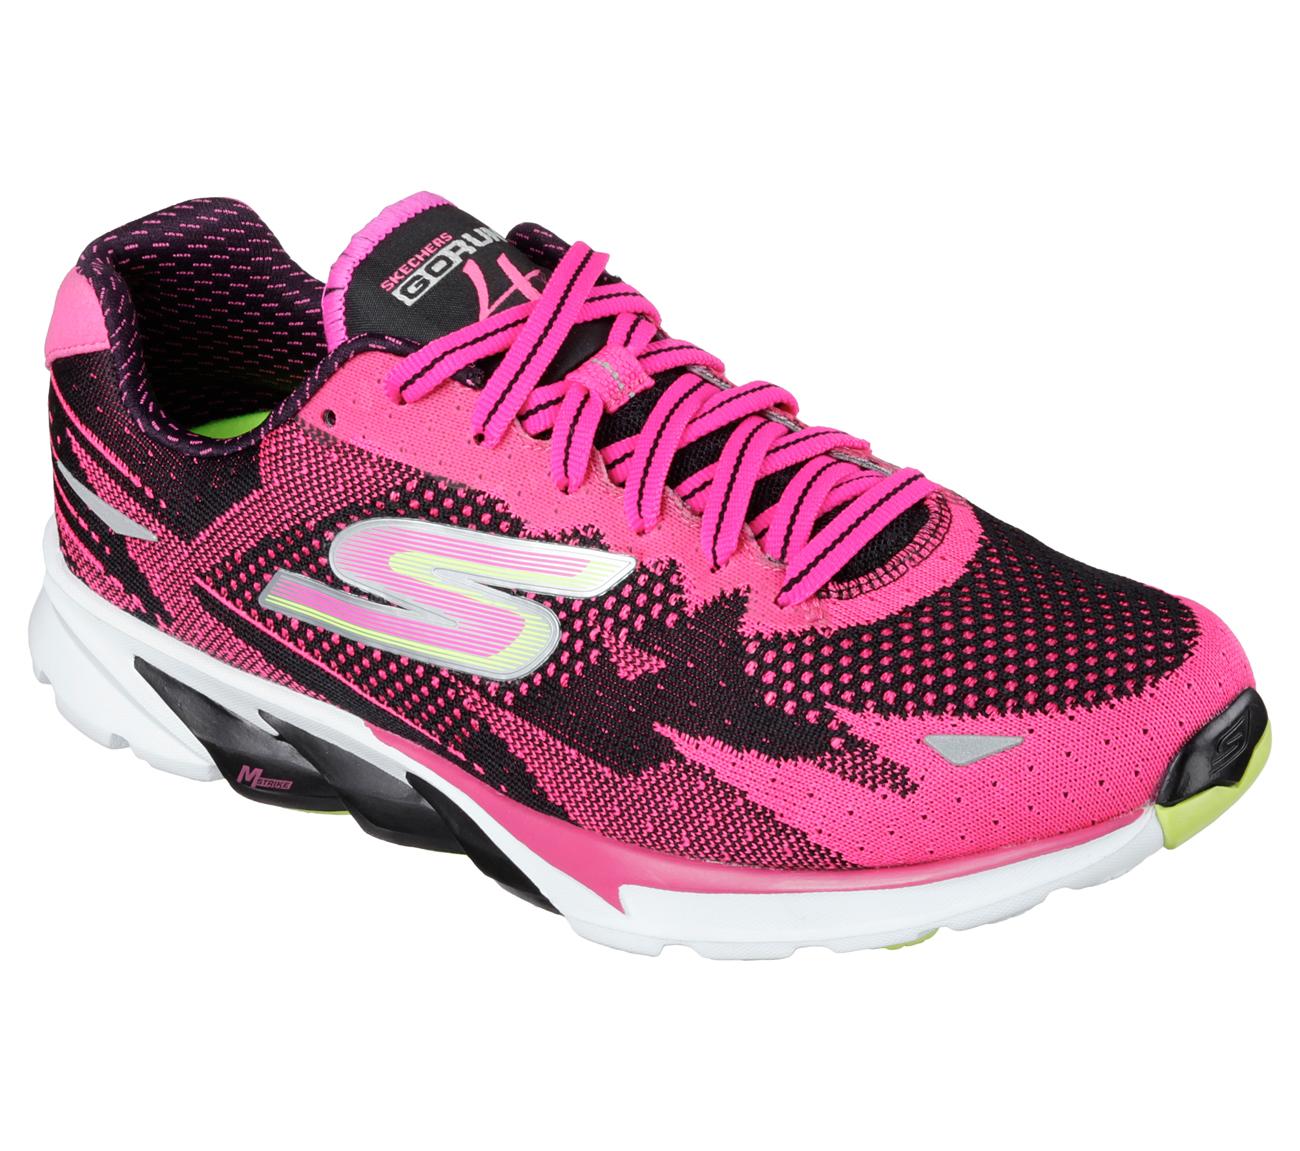 Skechers Sport Shoes For Girls